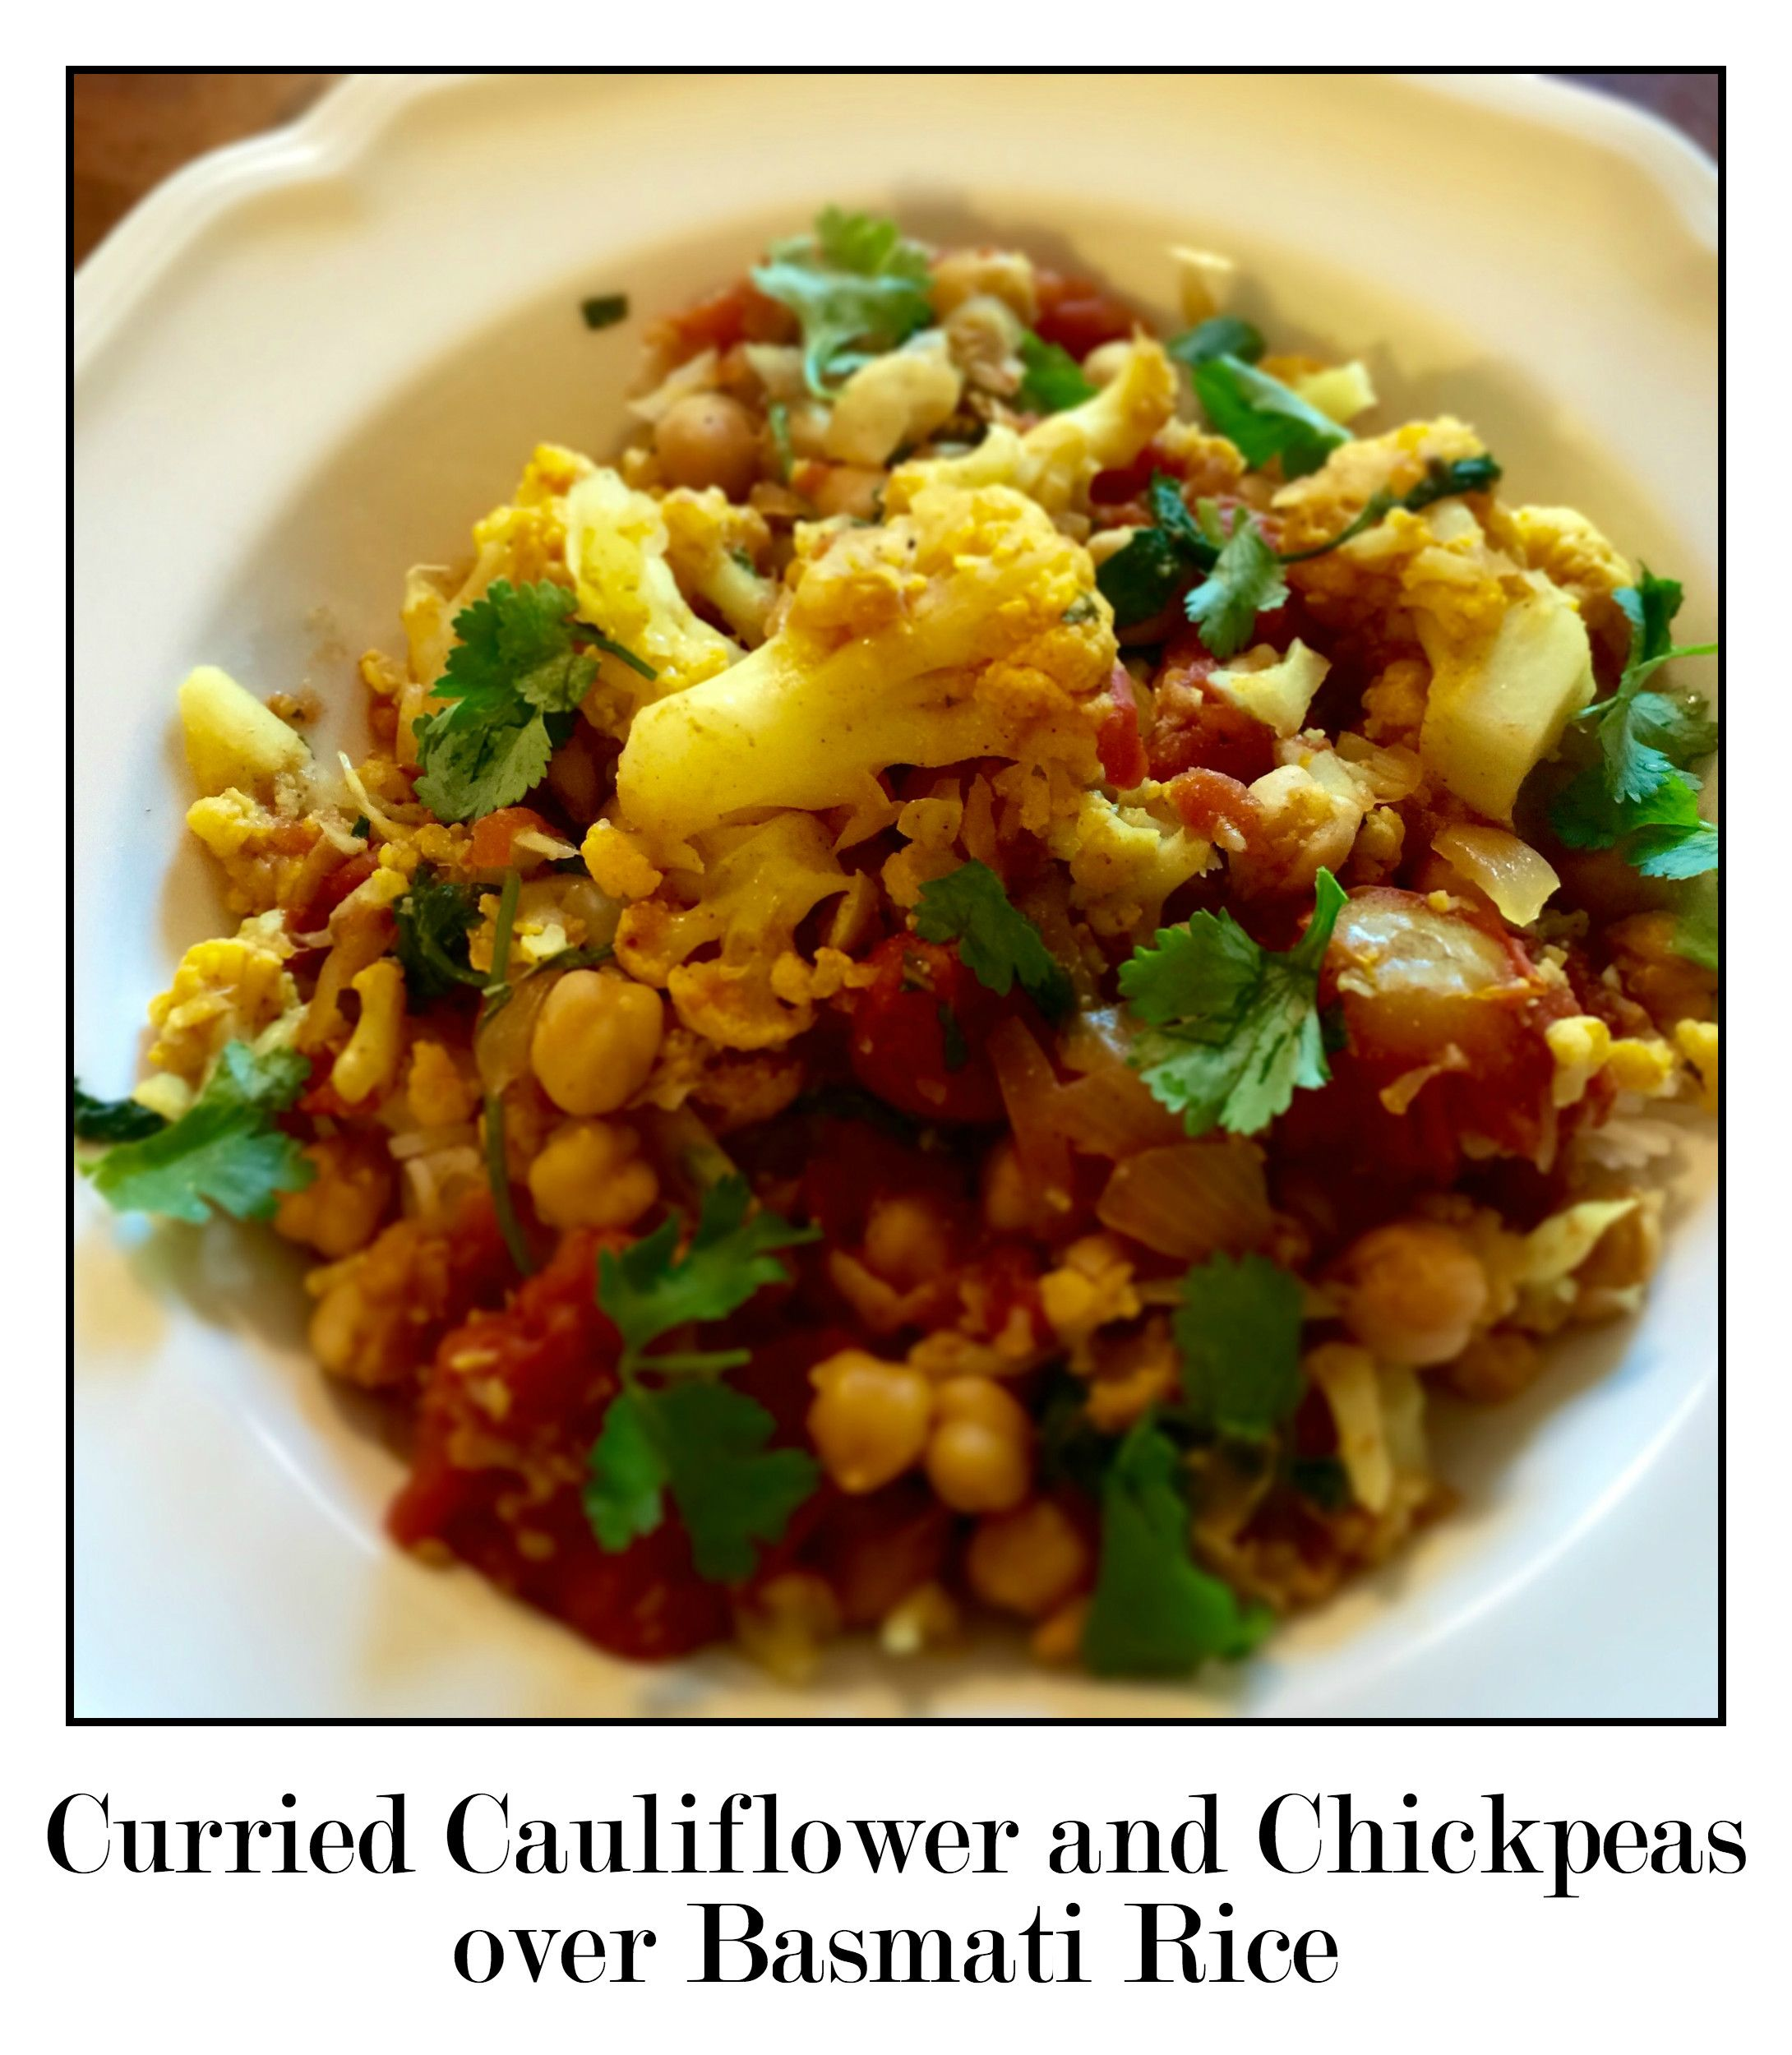 Curried Onion And Cauliflower Hummus Recipe: Curried Cauliflower And Chickpeas Over Basmati Rice